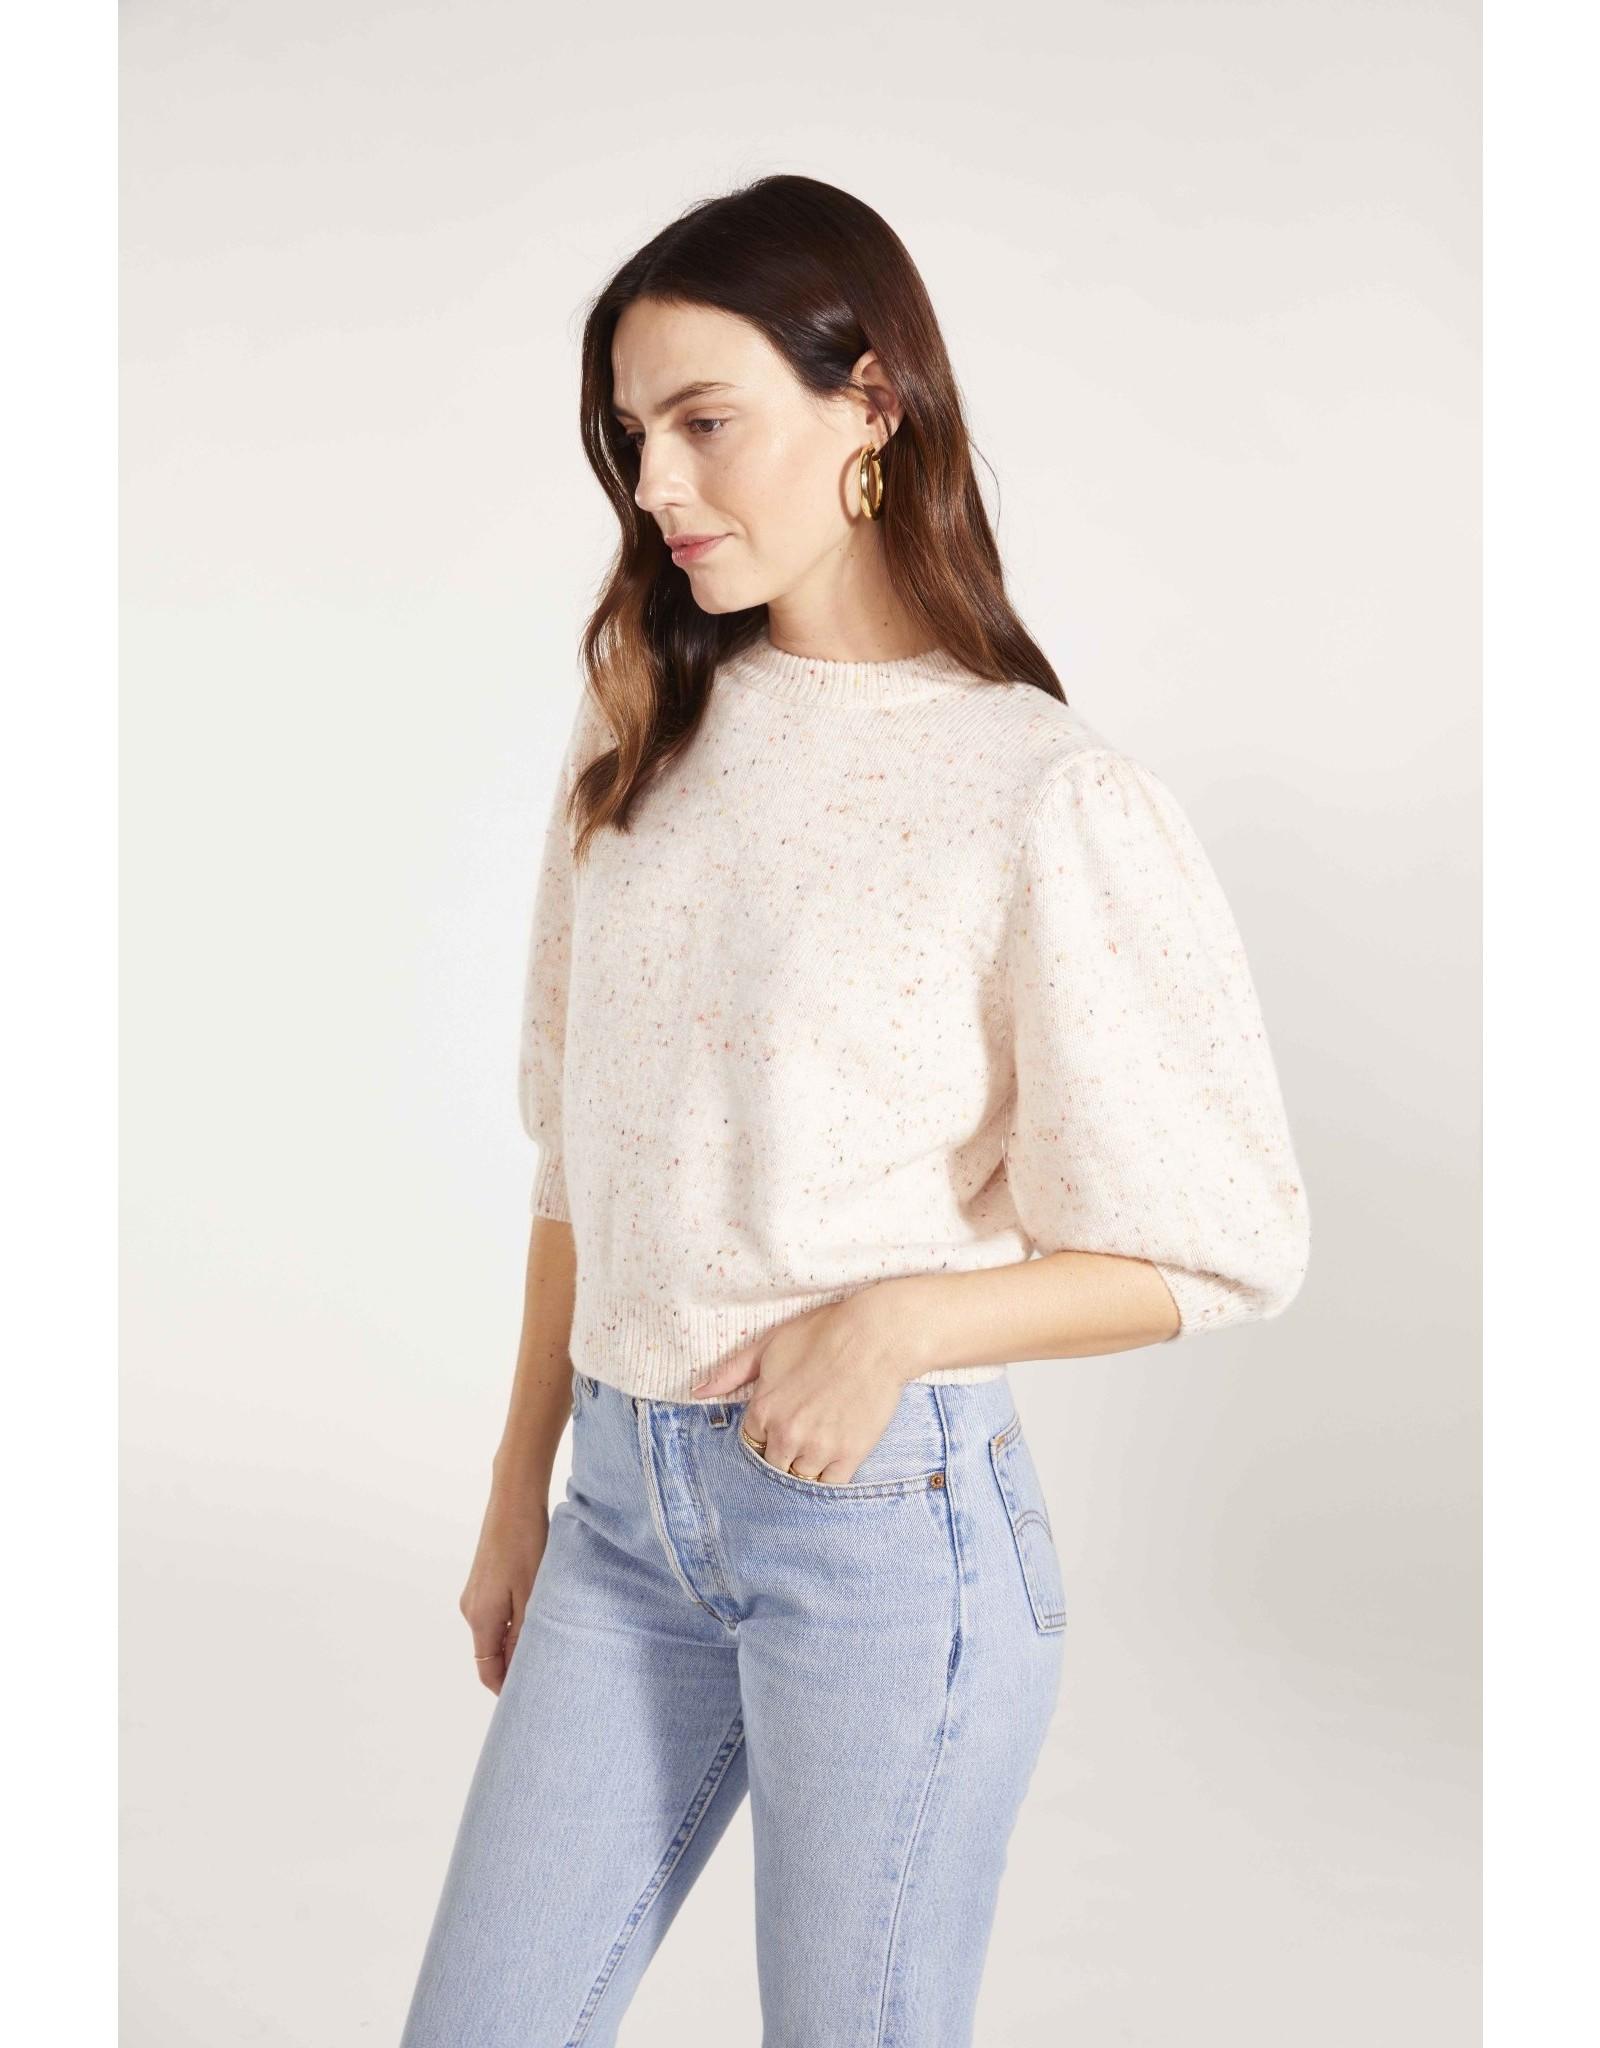 BB Mock Speckle Sweater